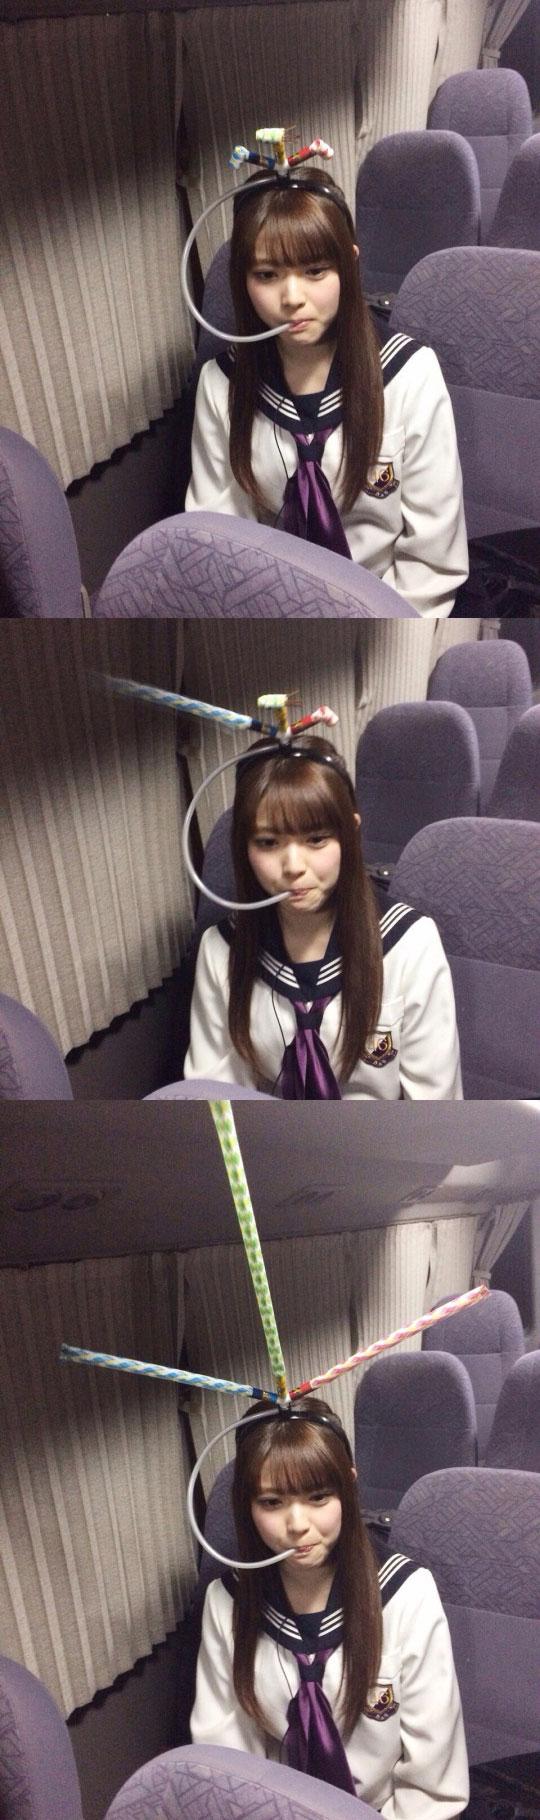 cool-Japanese-school-girl-invention-whistle-helmet